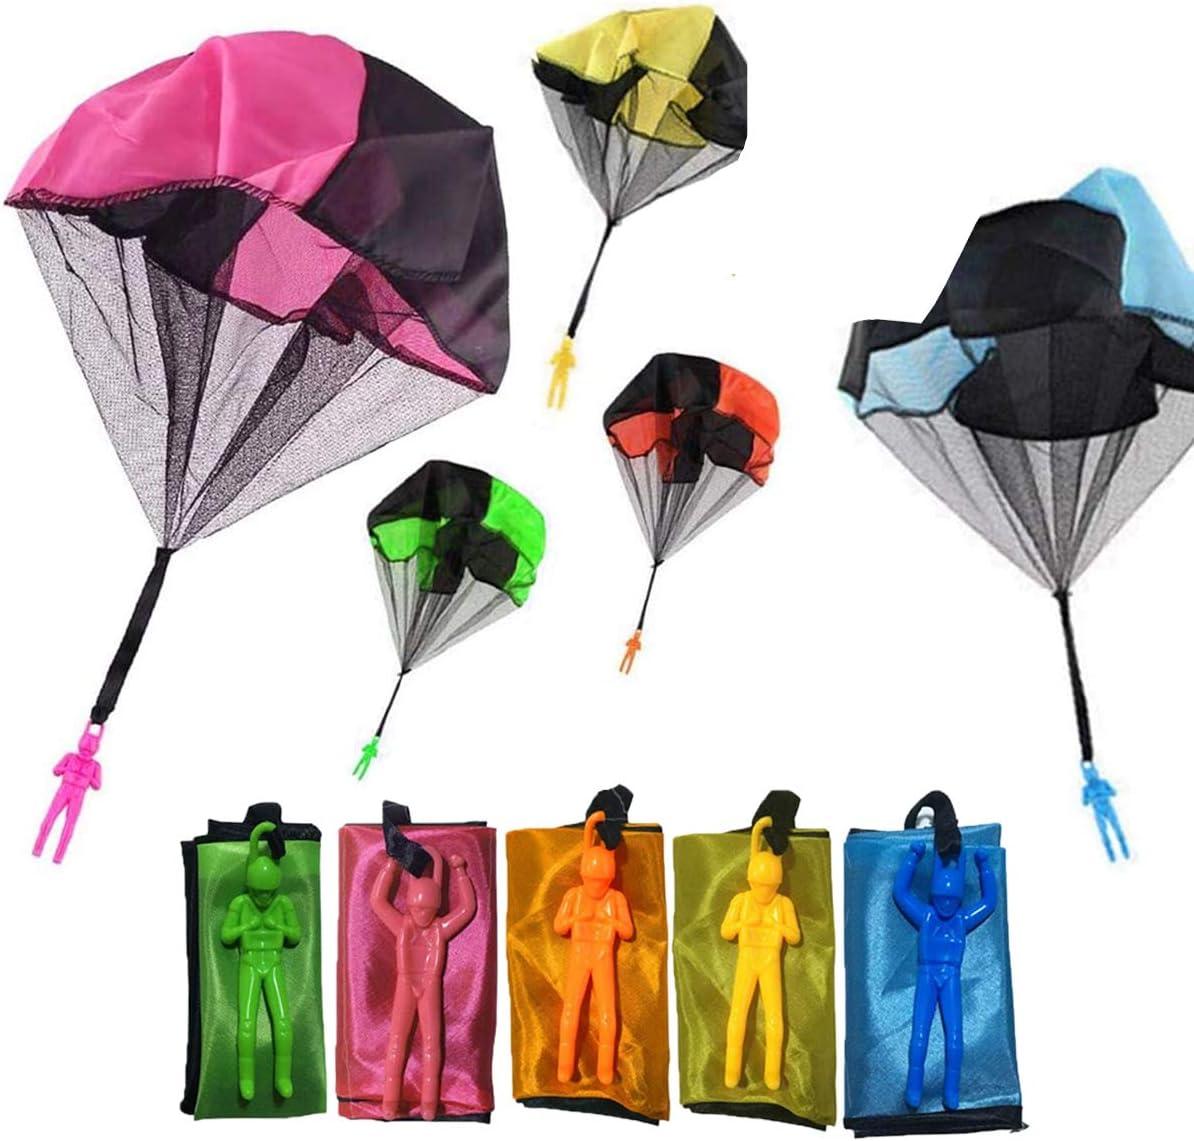 Monyus Parachute Toy 10 PCS Flying Toys Tangle Free Throwing Han